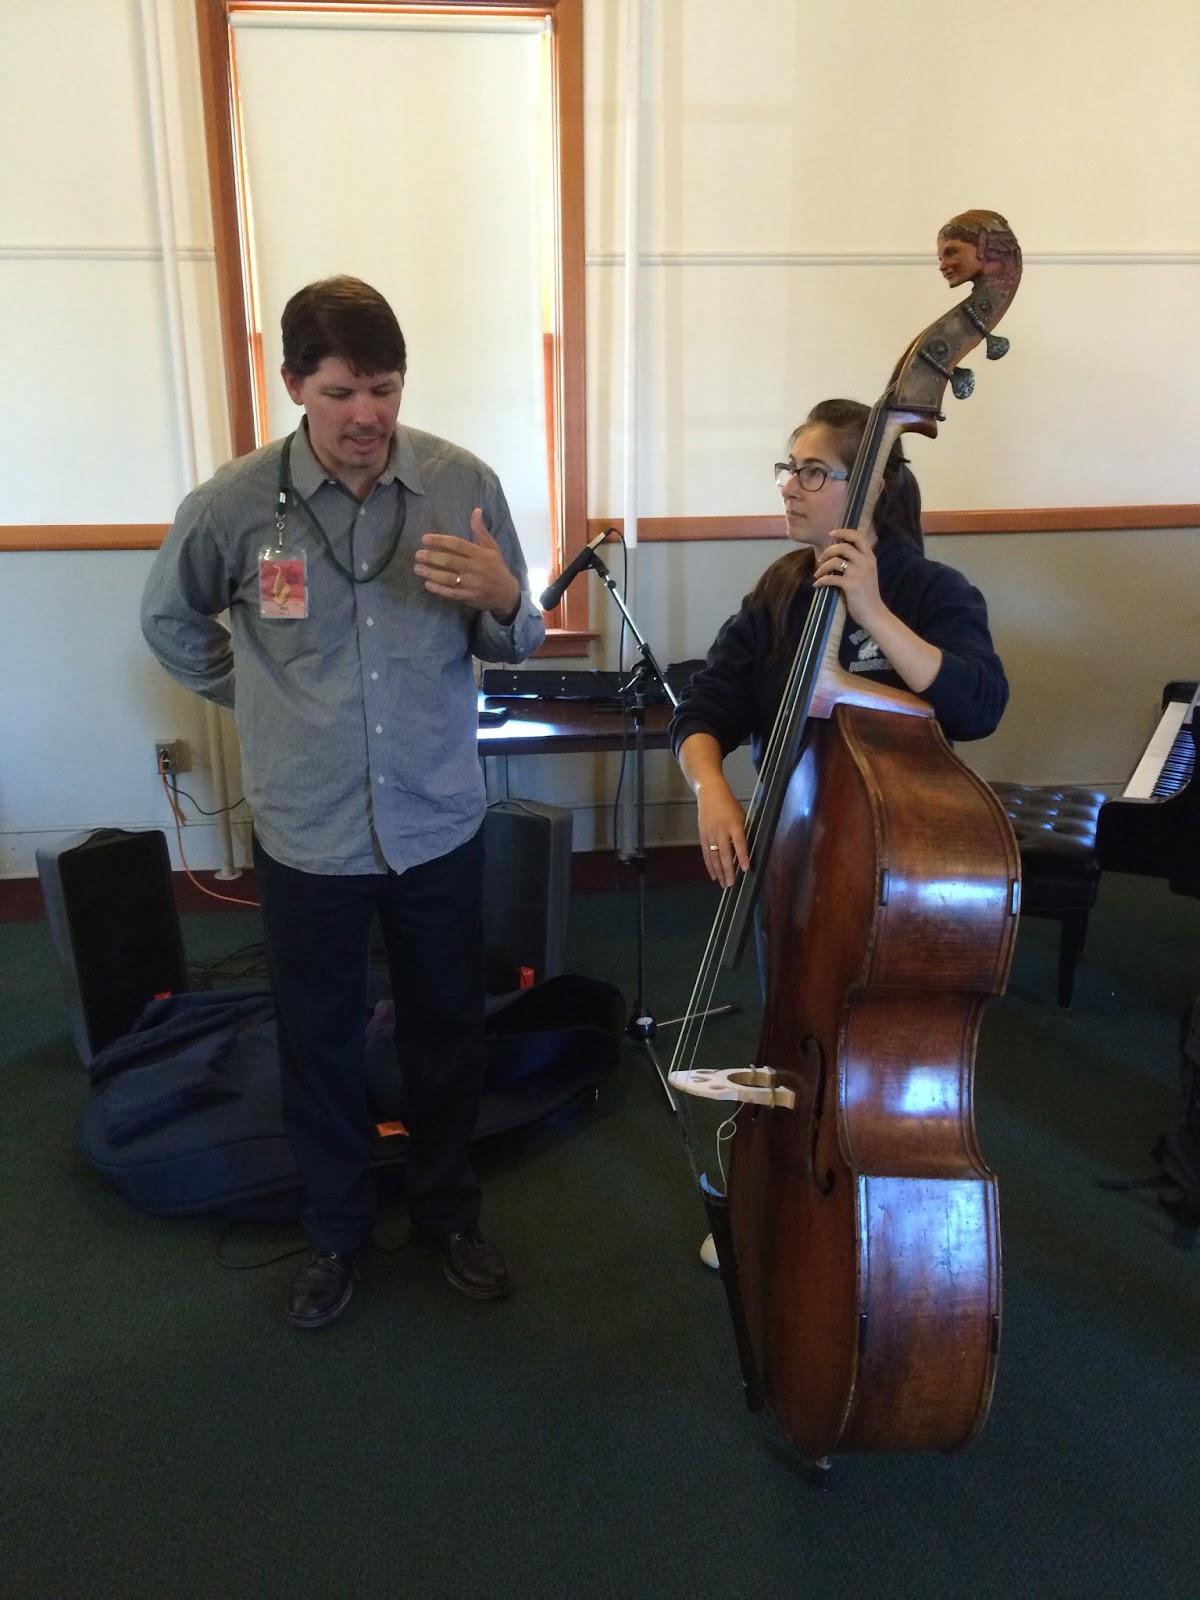 Ideas For Jazz Education Centrum Educator Track Part 2